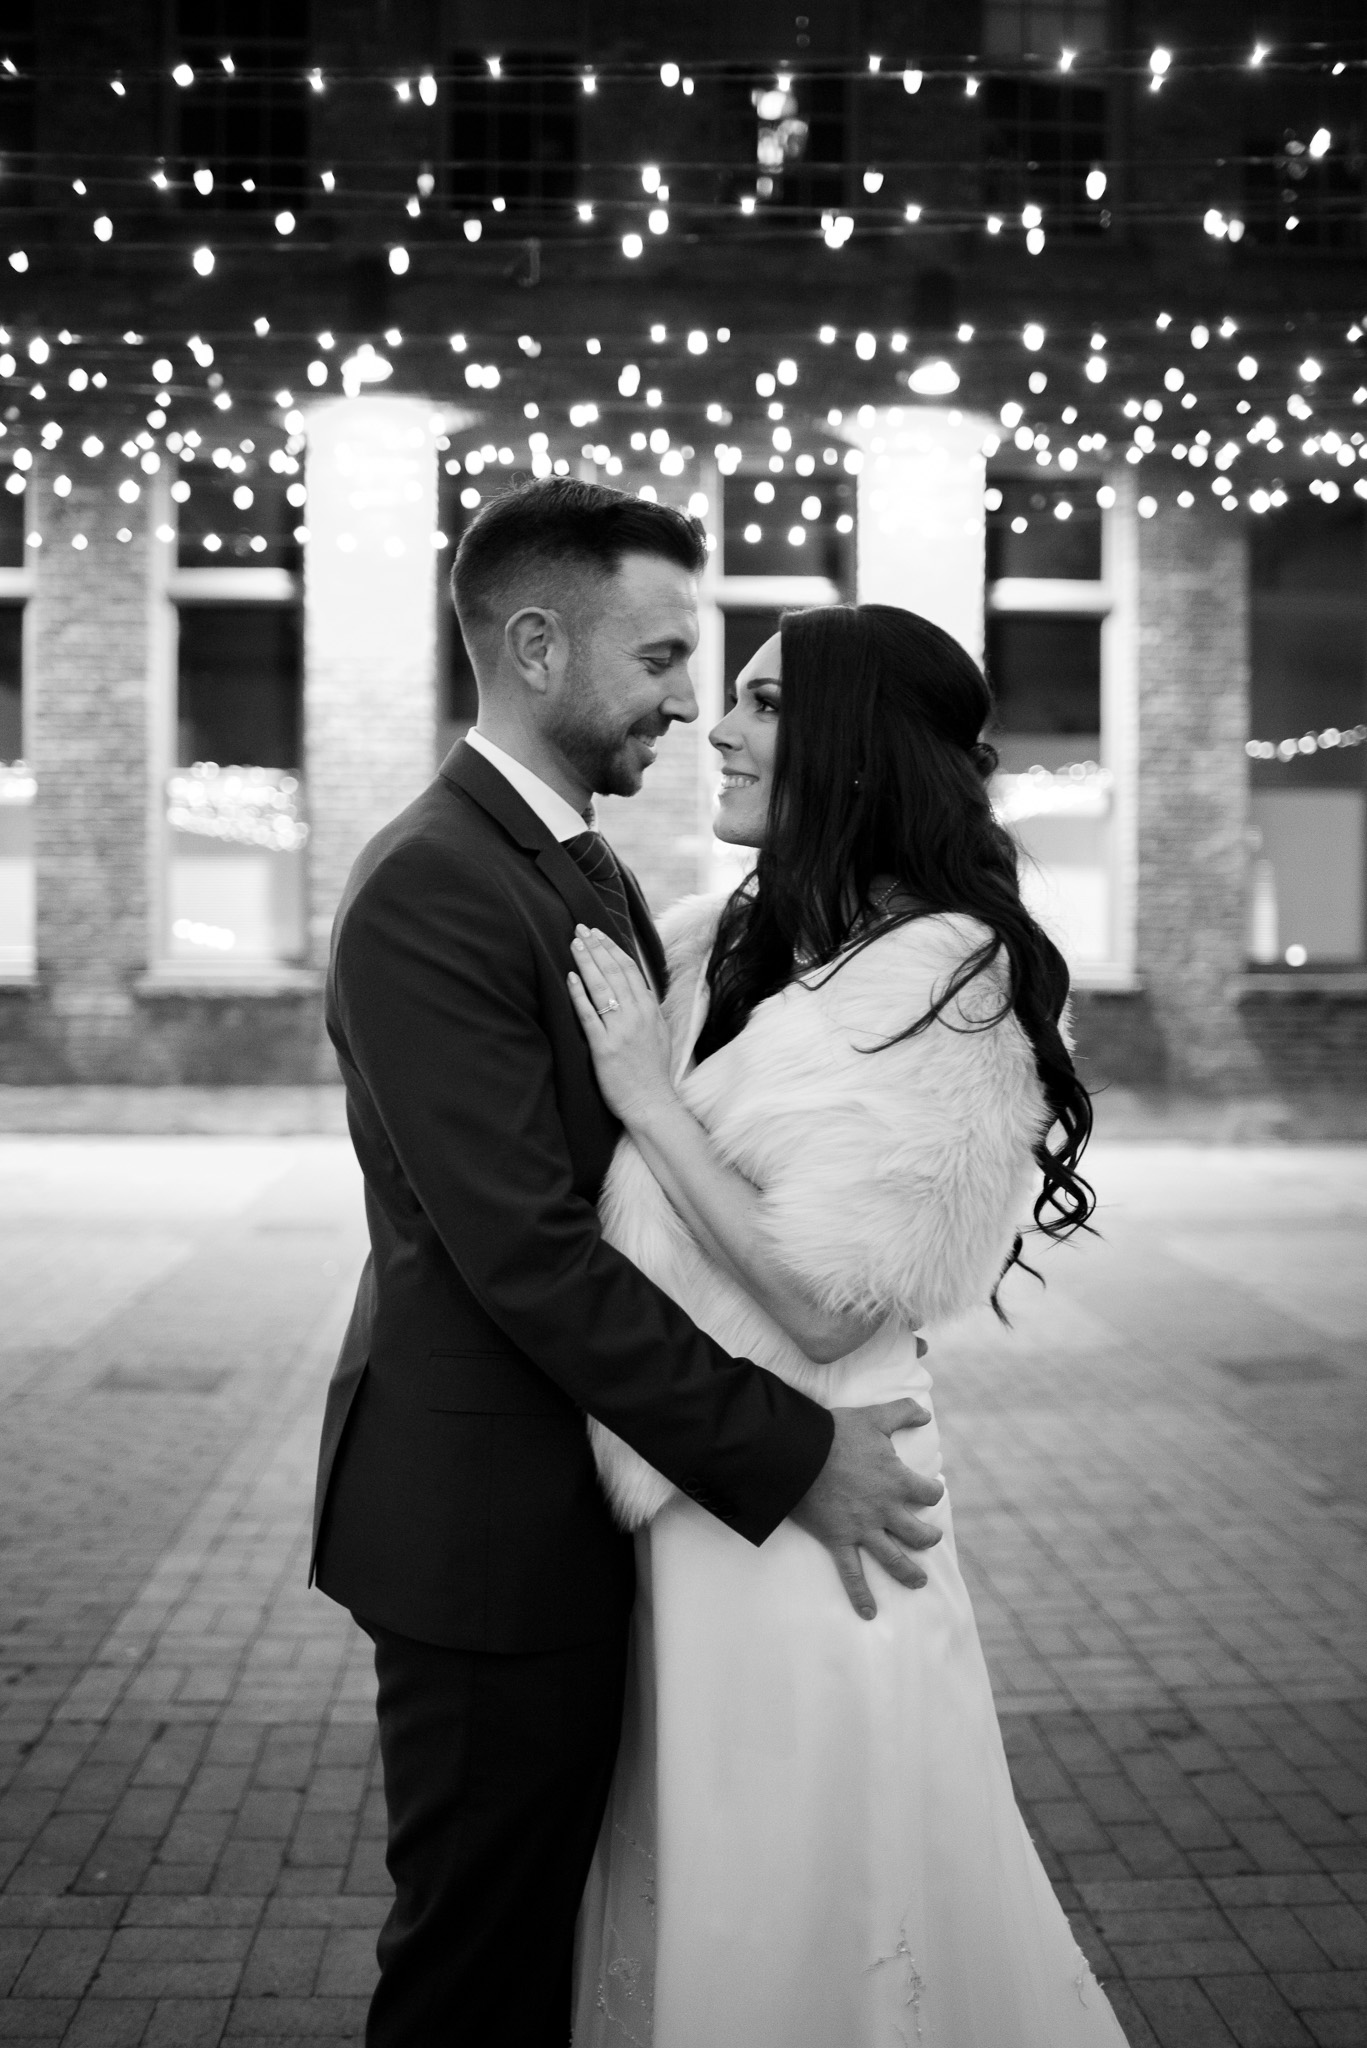 Brix and Mortar Wedding Photos-90.jpg